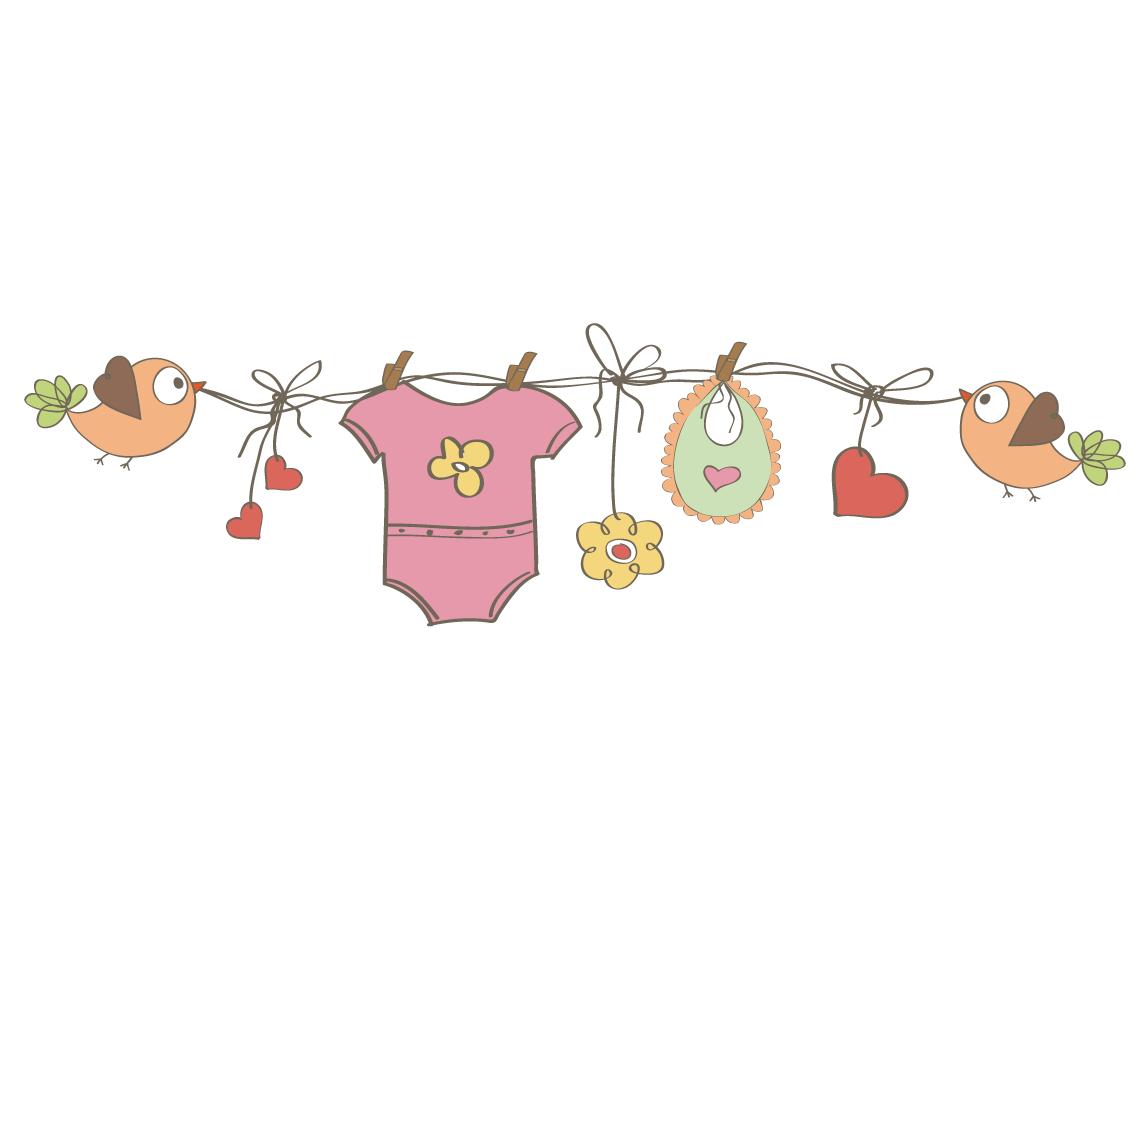 Pin Oleh Suelma Vieira Di Baby Shower Kartu Bayi Kartu Desain Produk